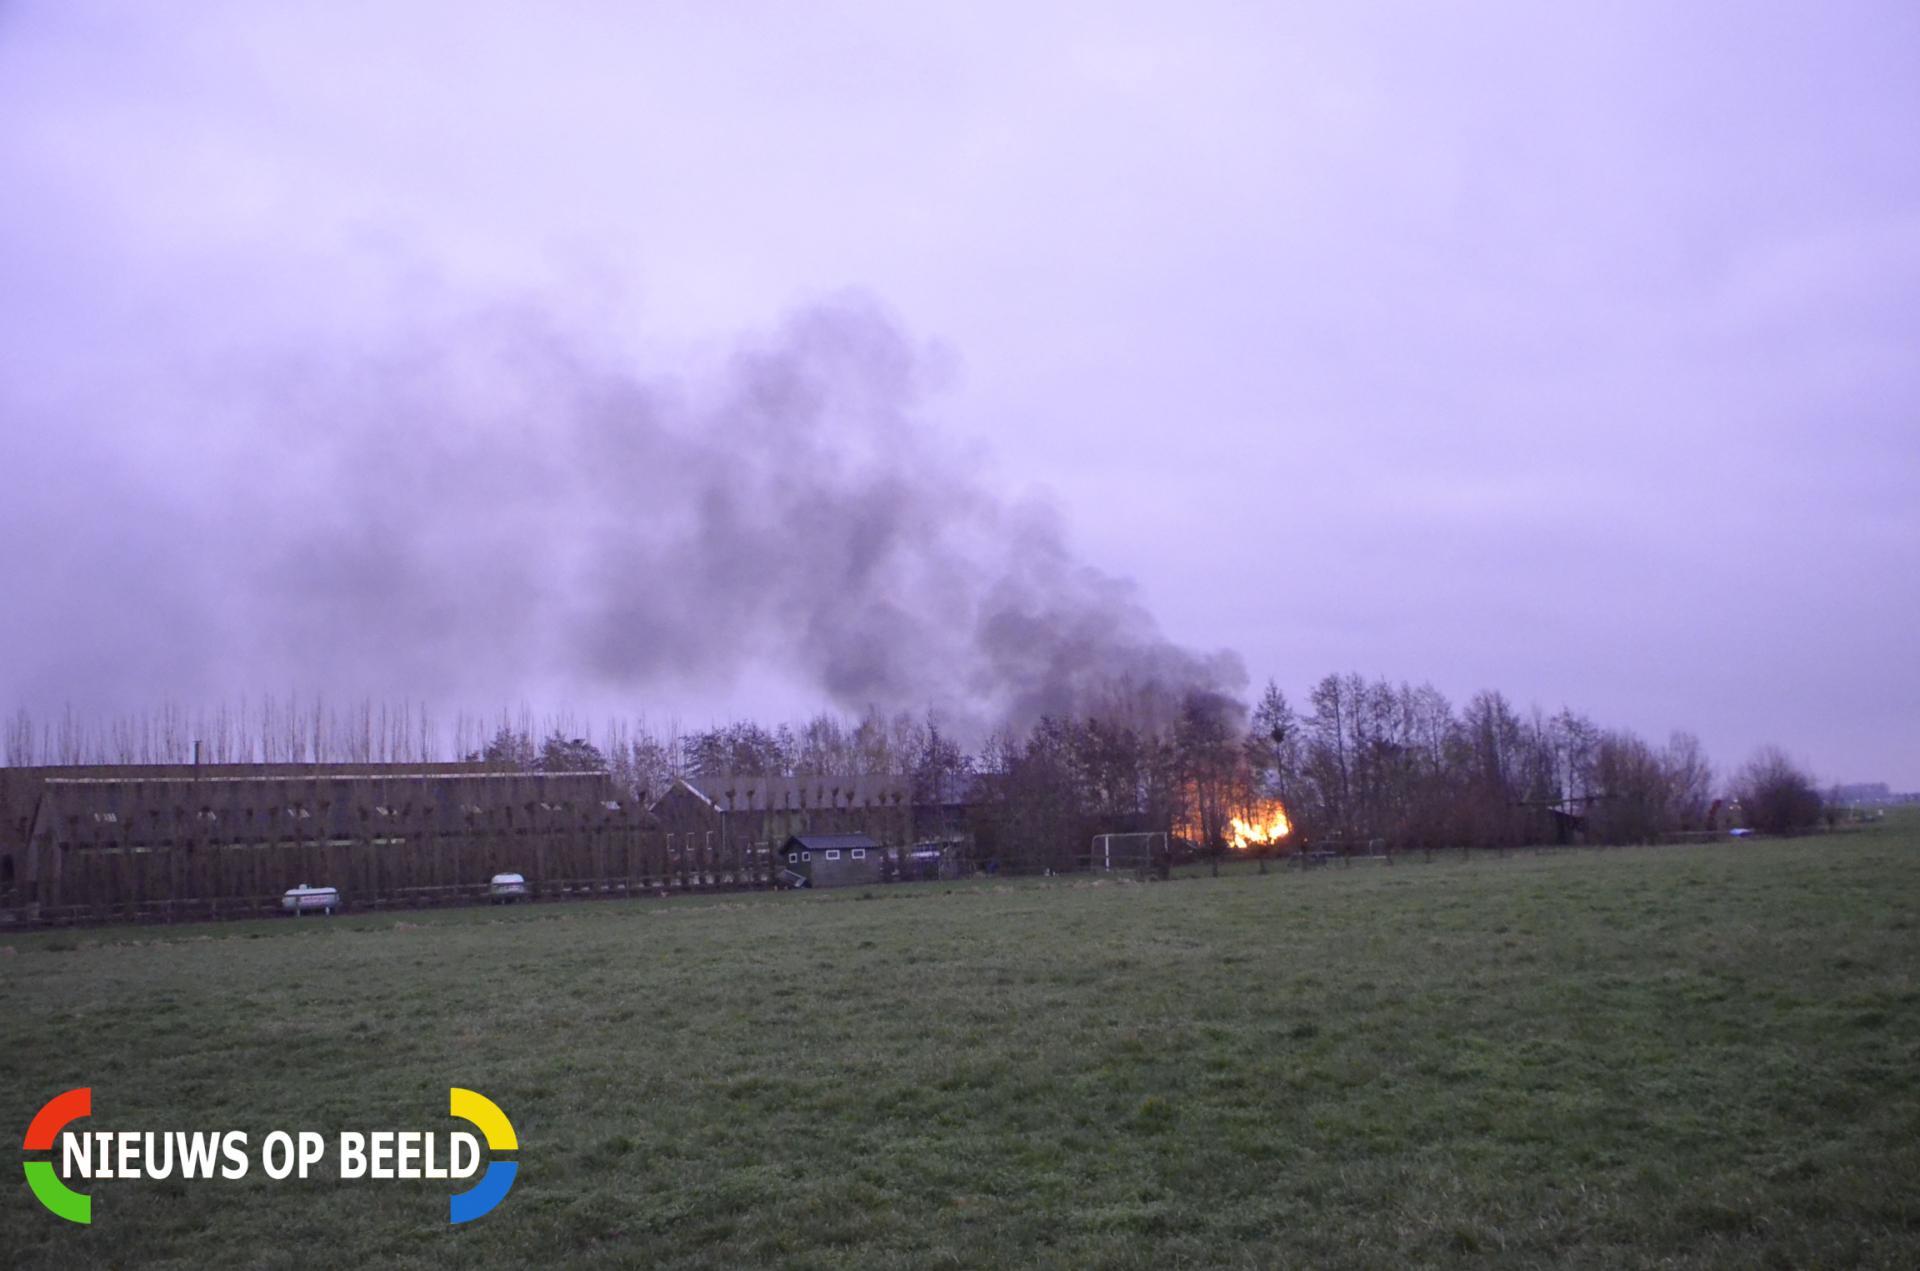 Gebouwbrand blijkt groot vreugdevuur Benedenberg Bergambacht